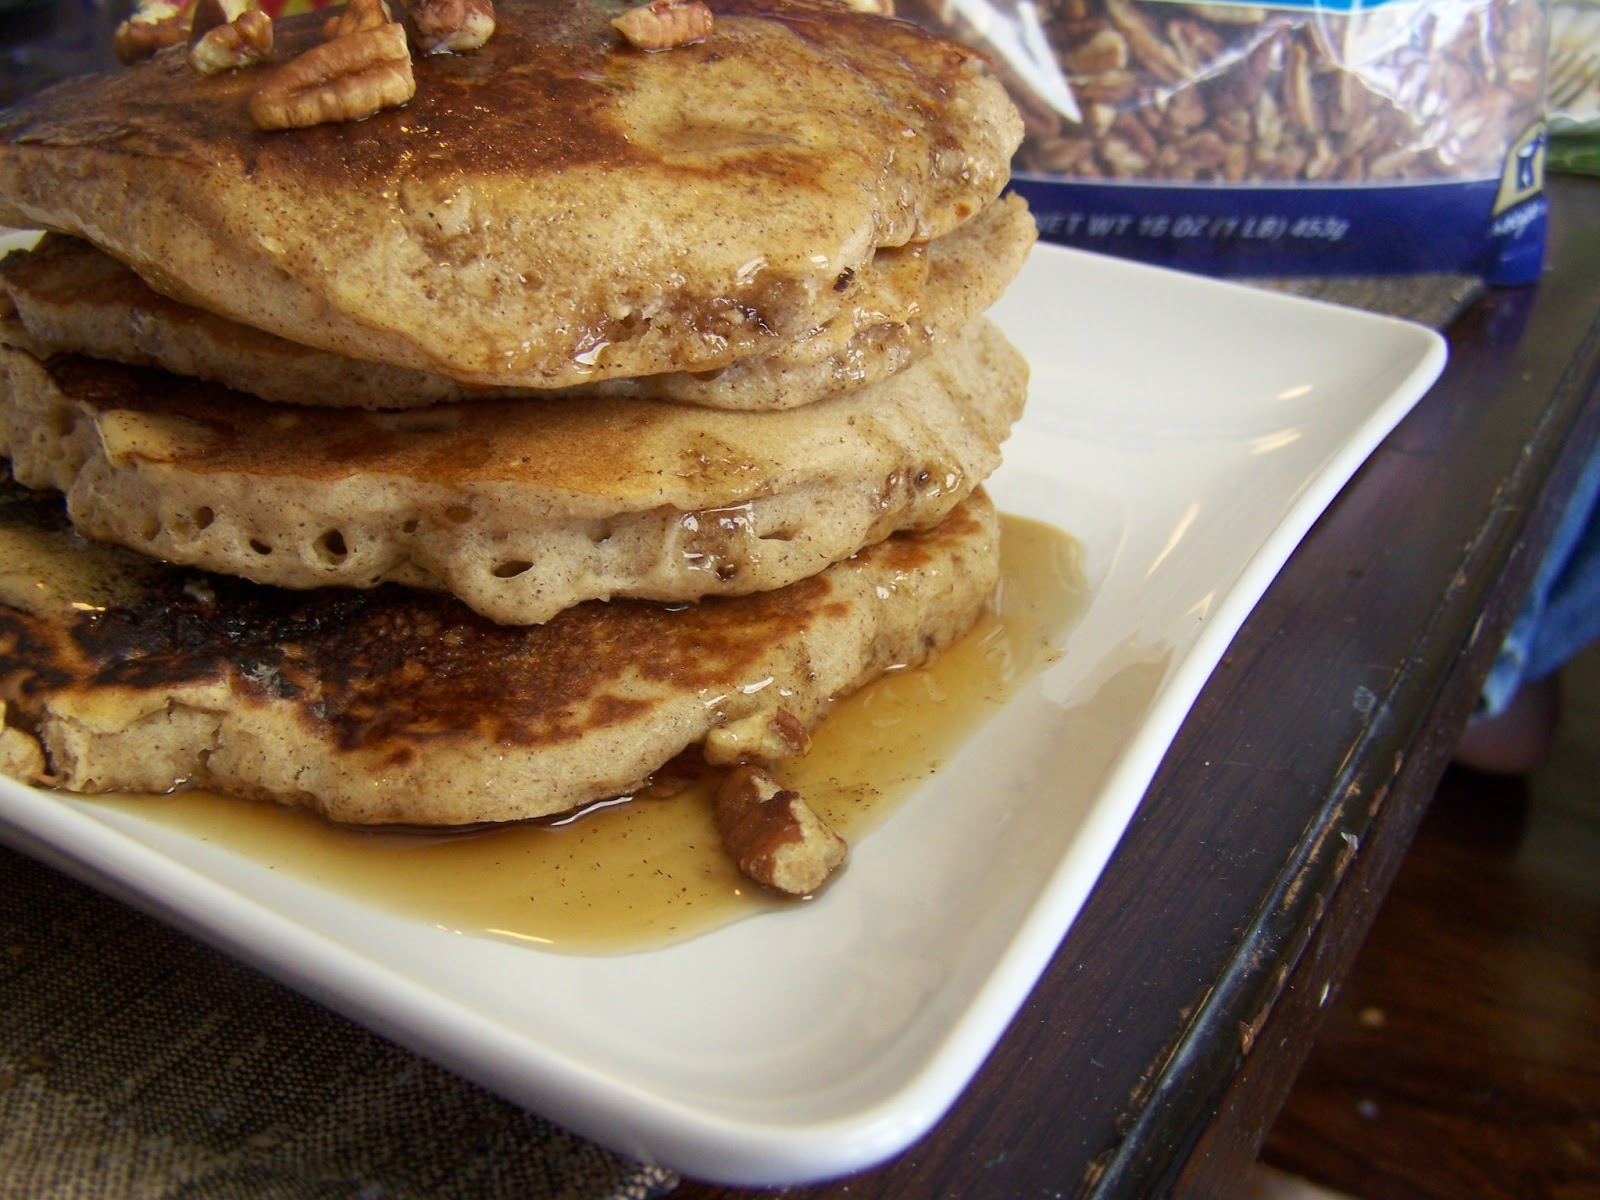 california raisin s oatmeal raisin pancakes oatmeal raisin ...